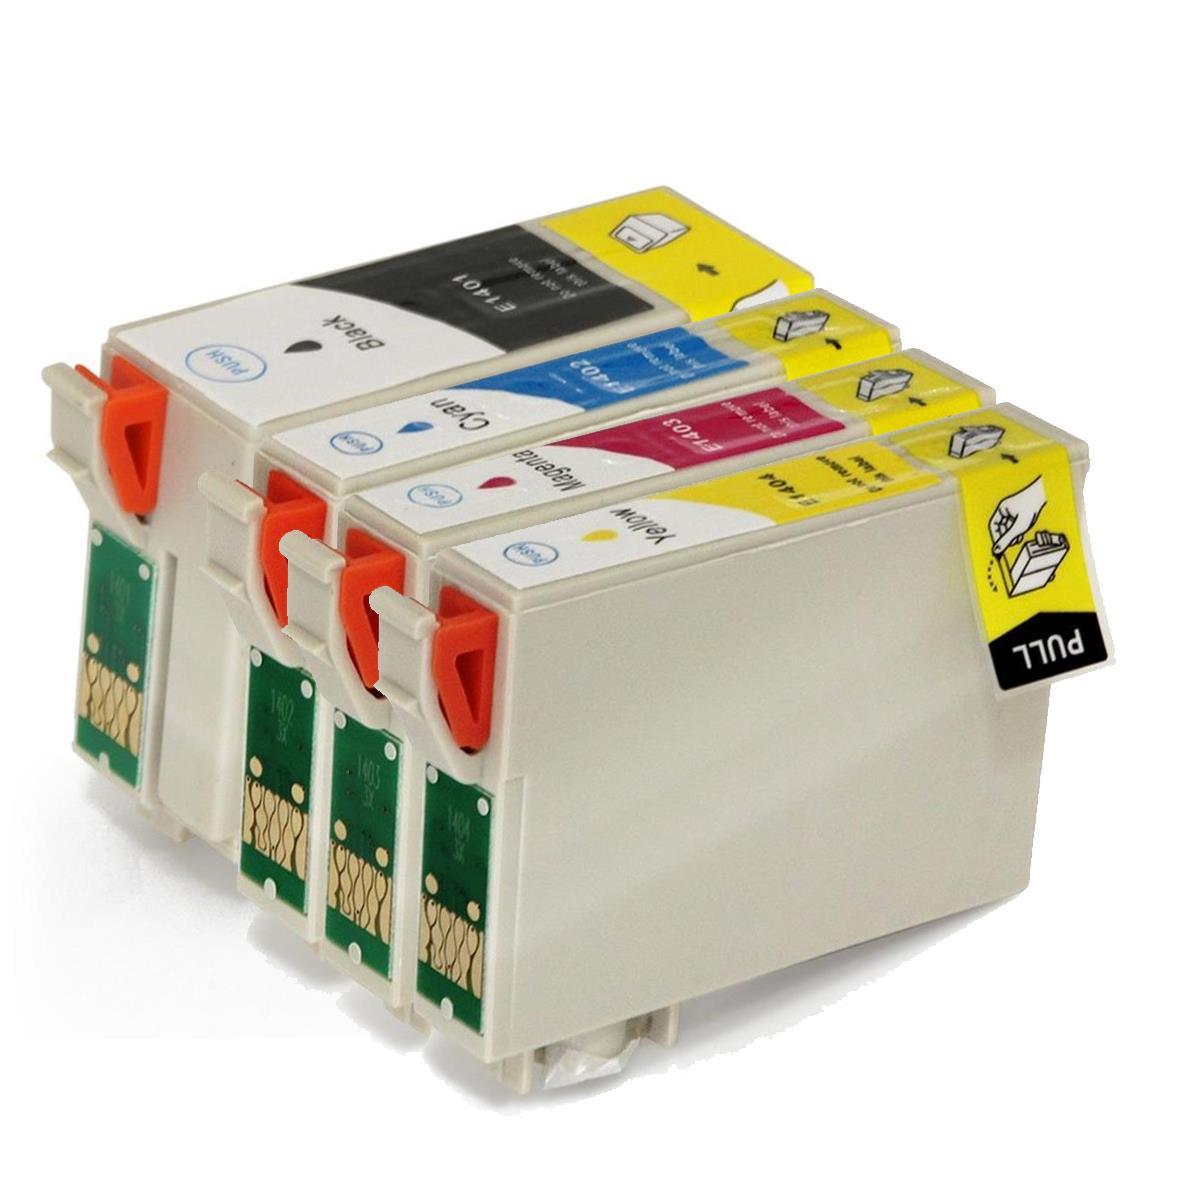 Kit 4 Cartuchos Compatíveis 140 Epson TX5600 / TX620